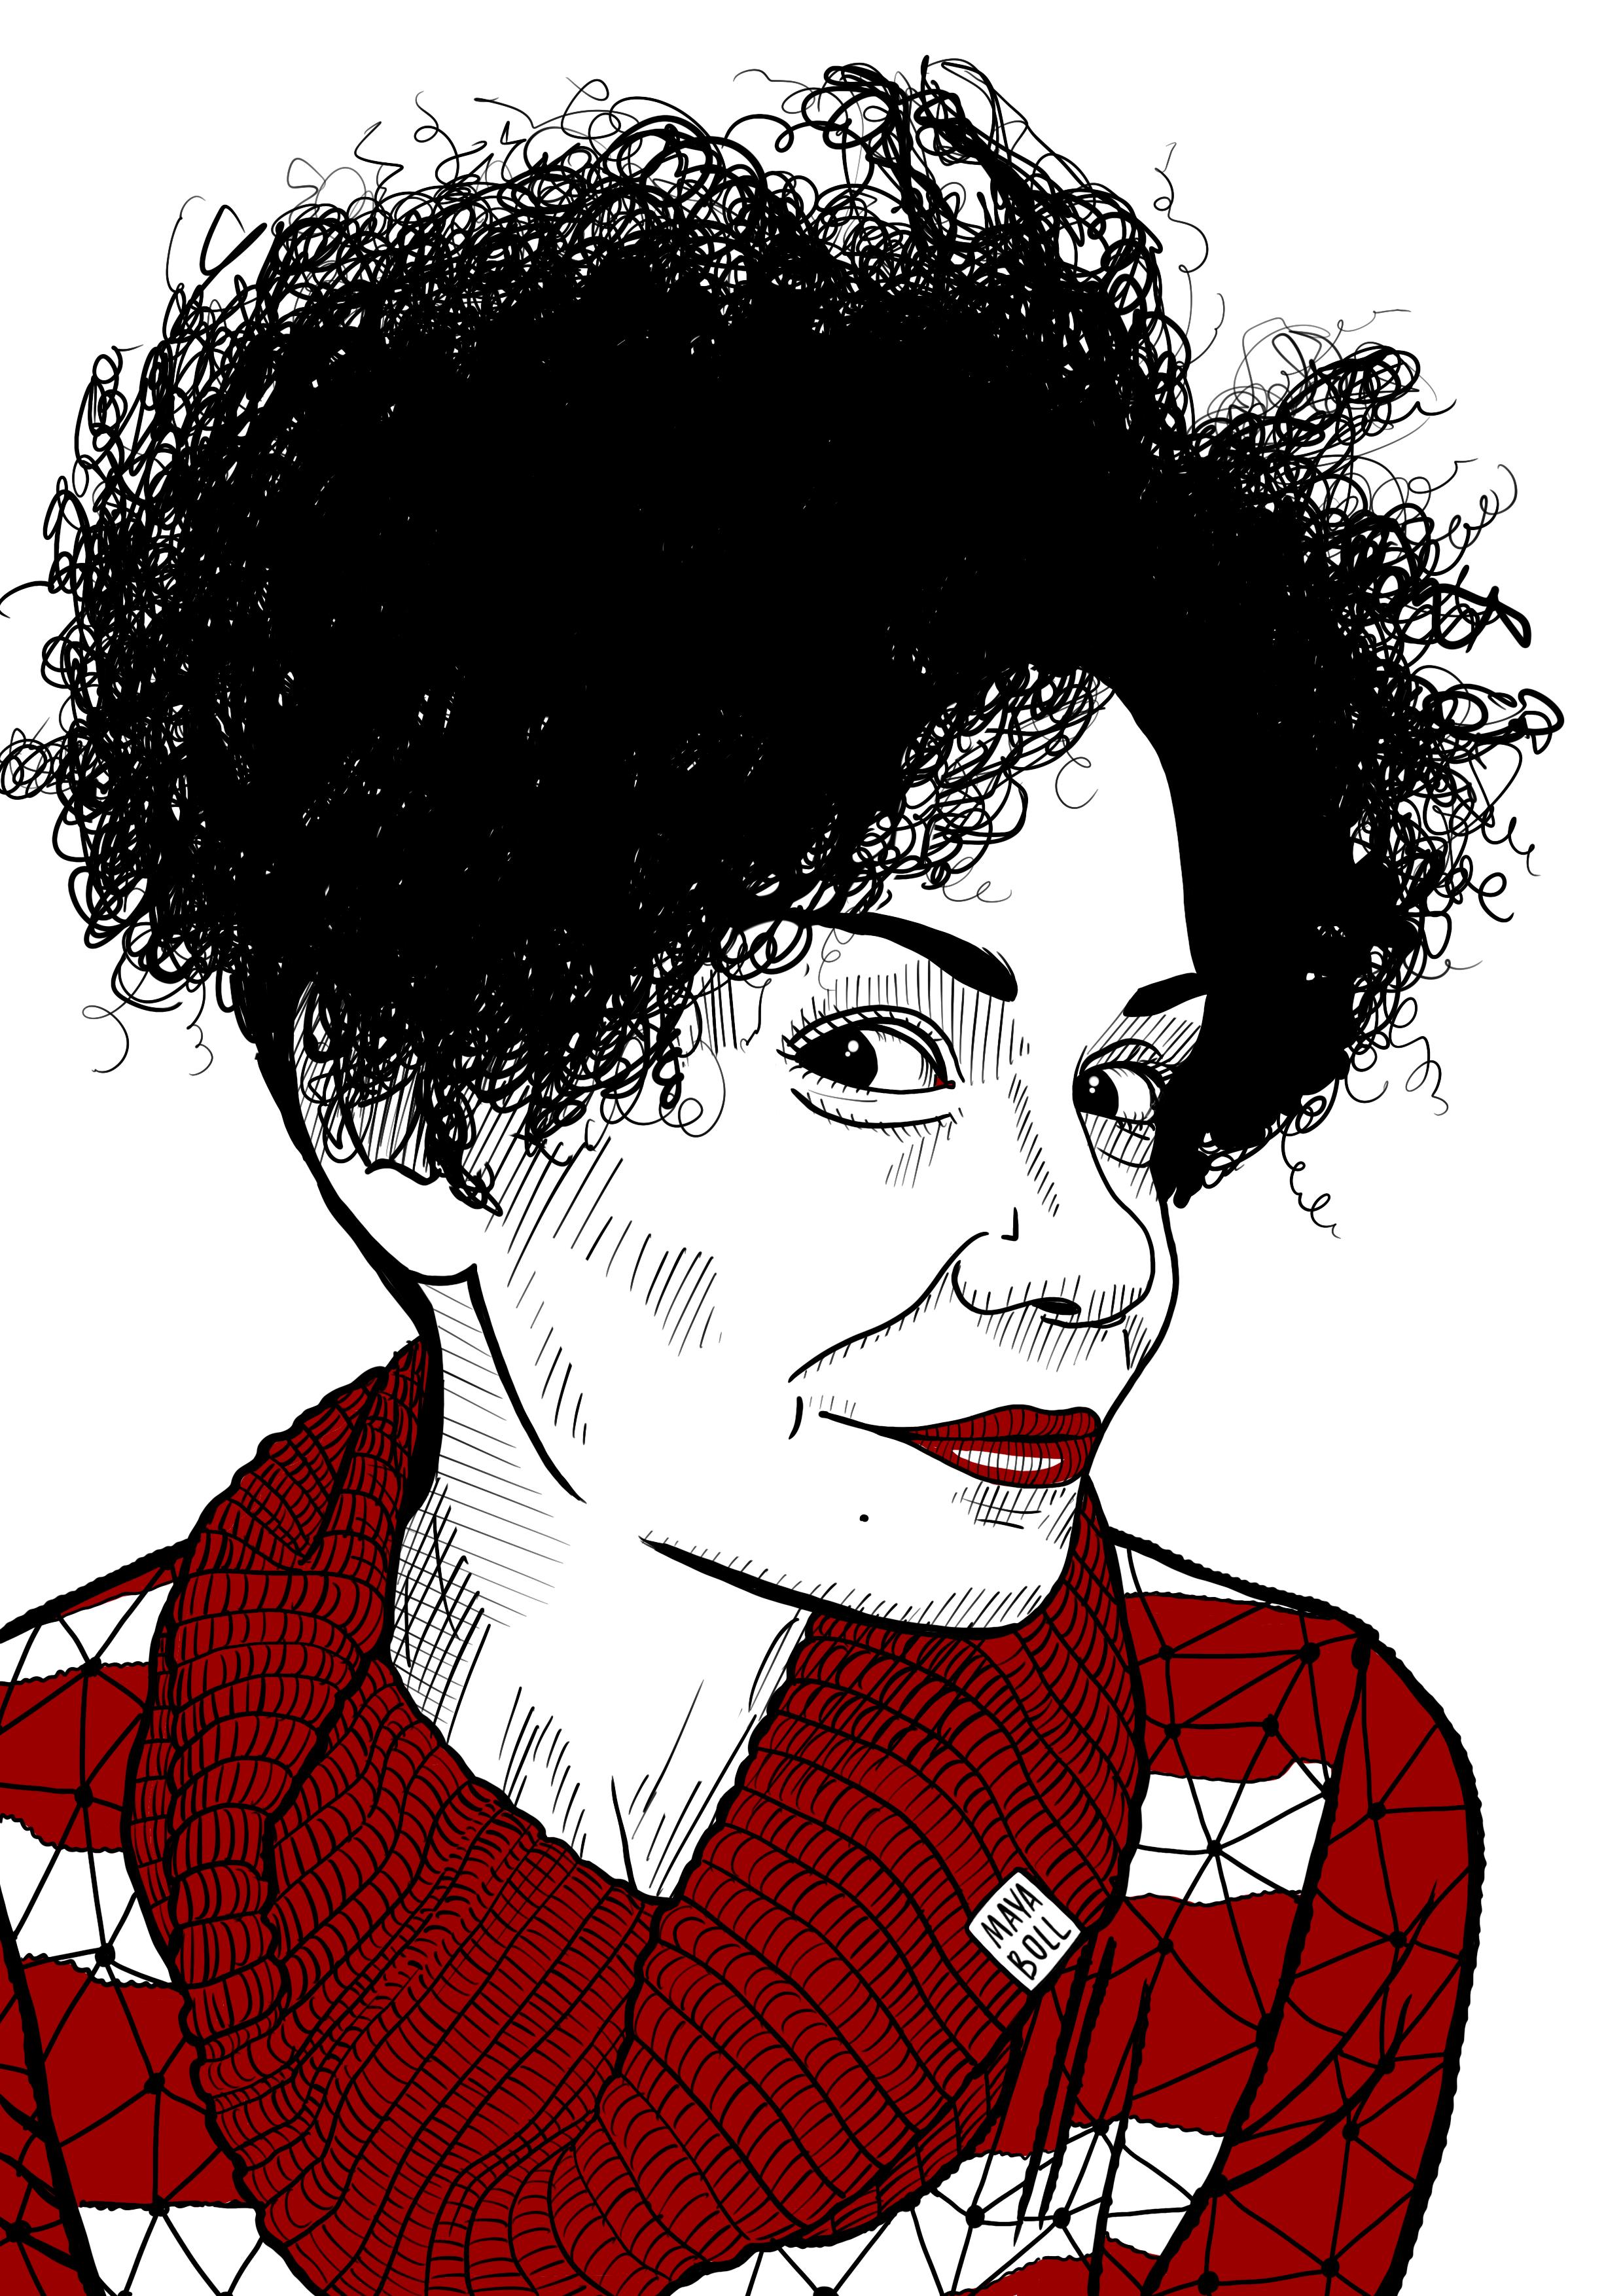 Elena Bucciarelli